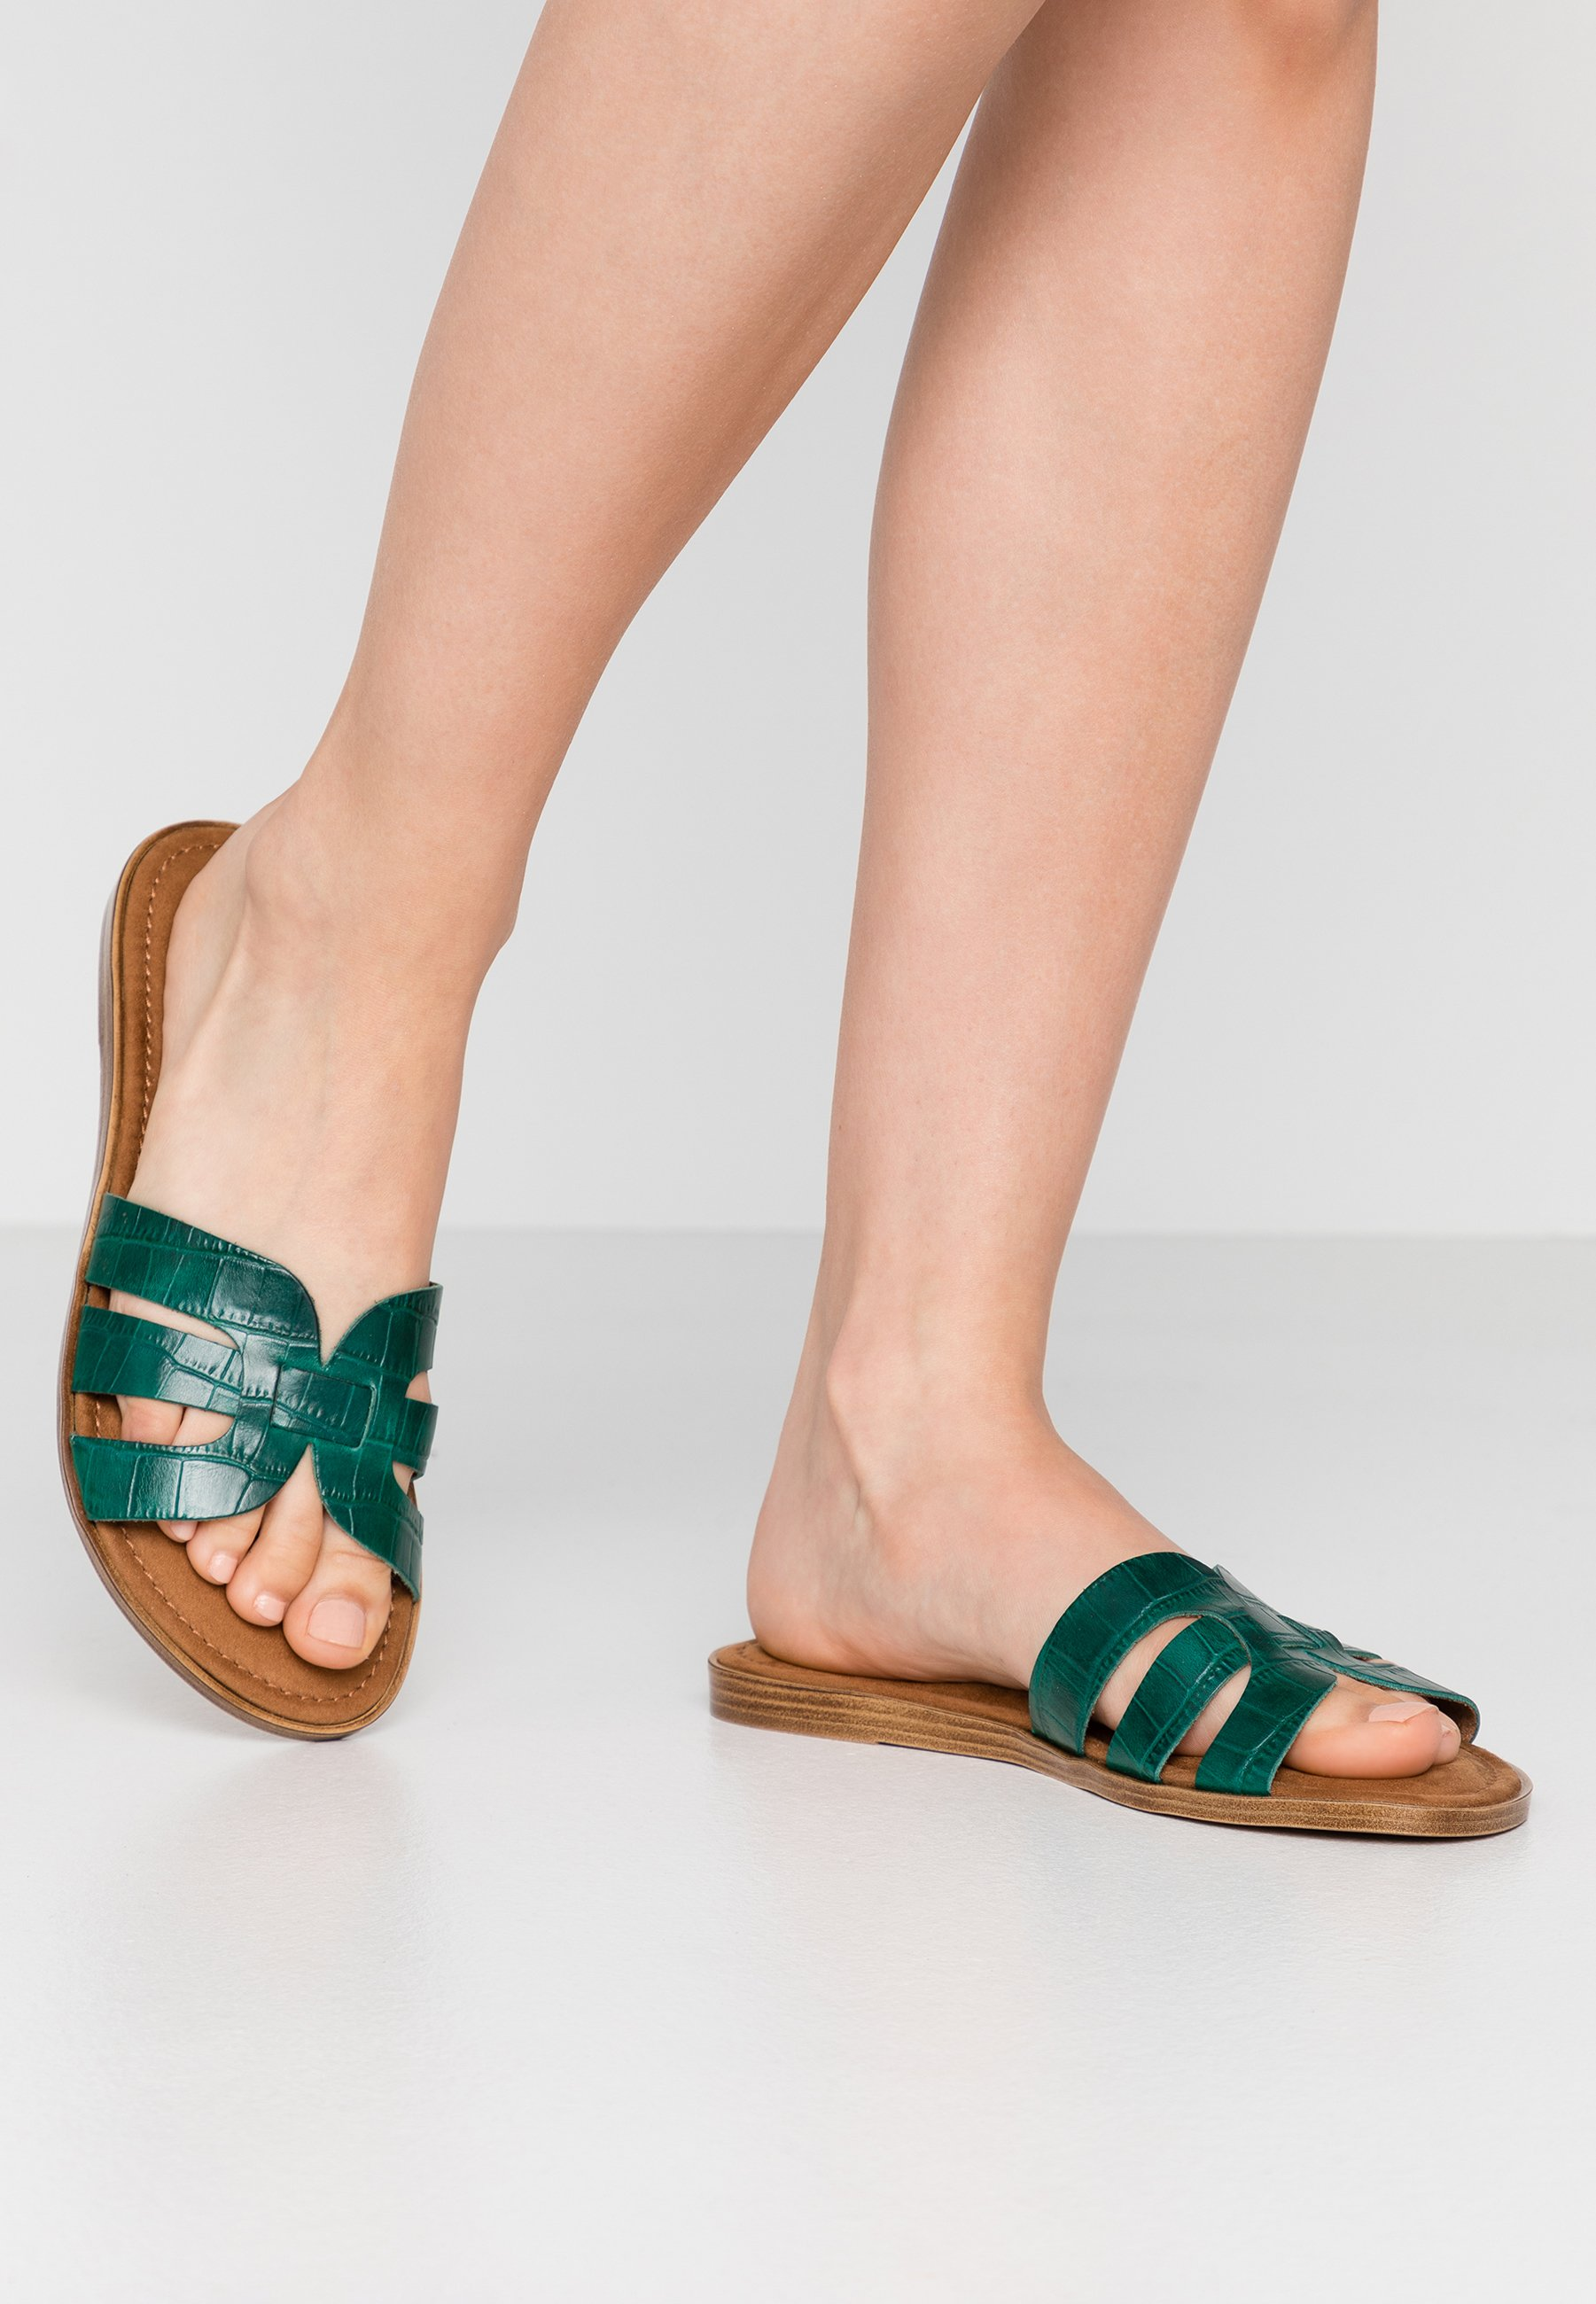 Tamaris Slides - Sandaler Bottle